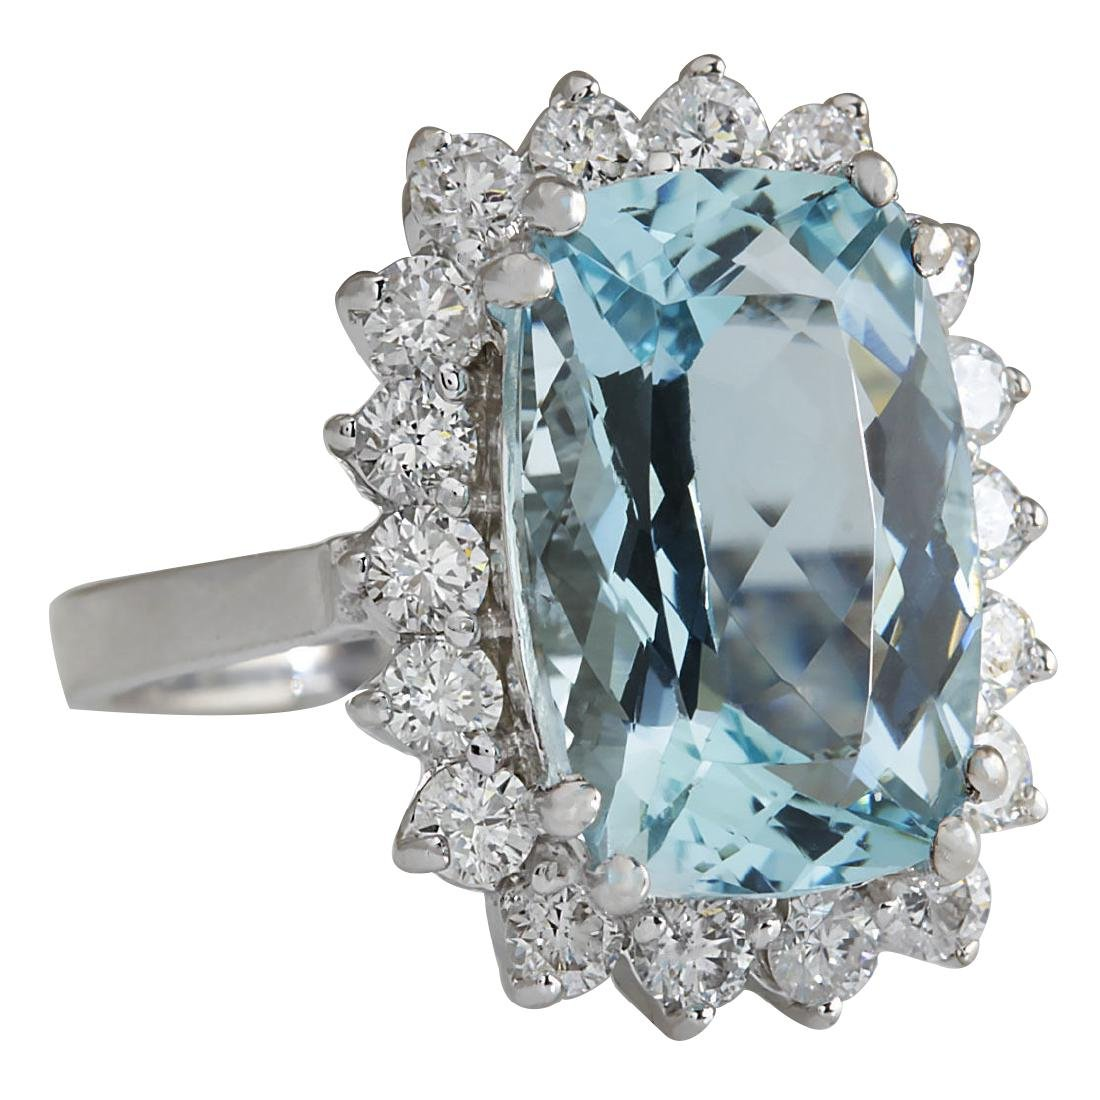 7.00CTW Natural Aquamarine And Diamond Ring In 18K - 2